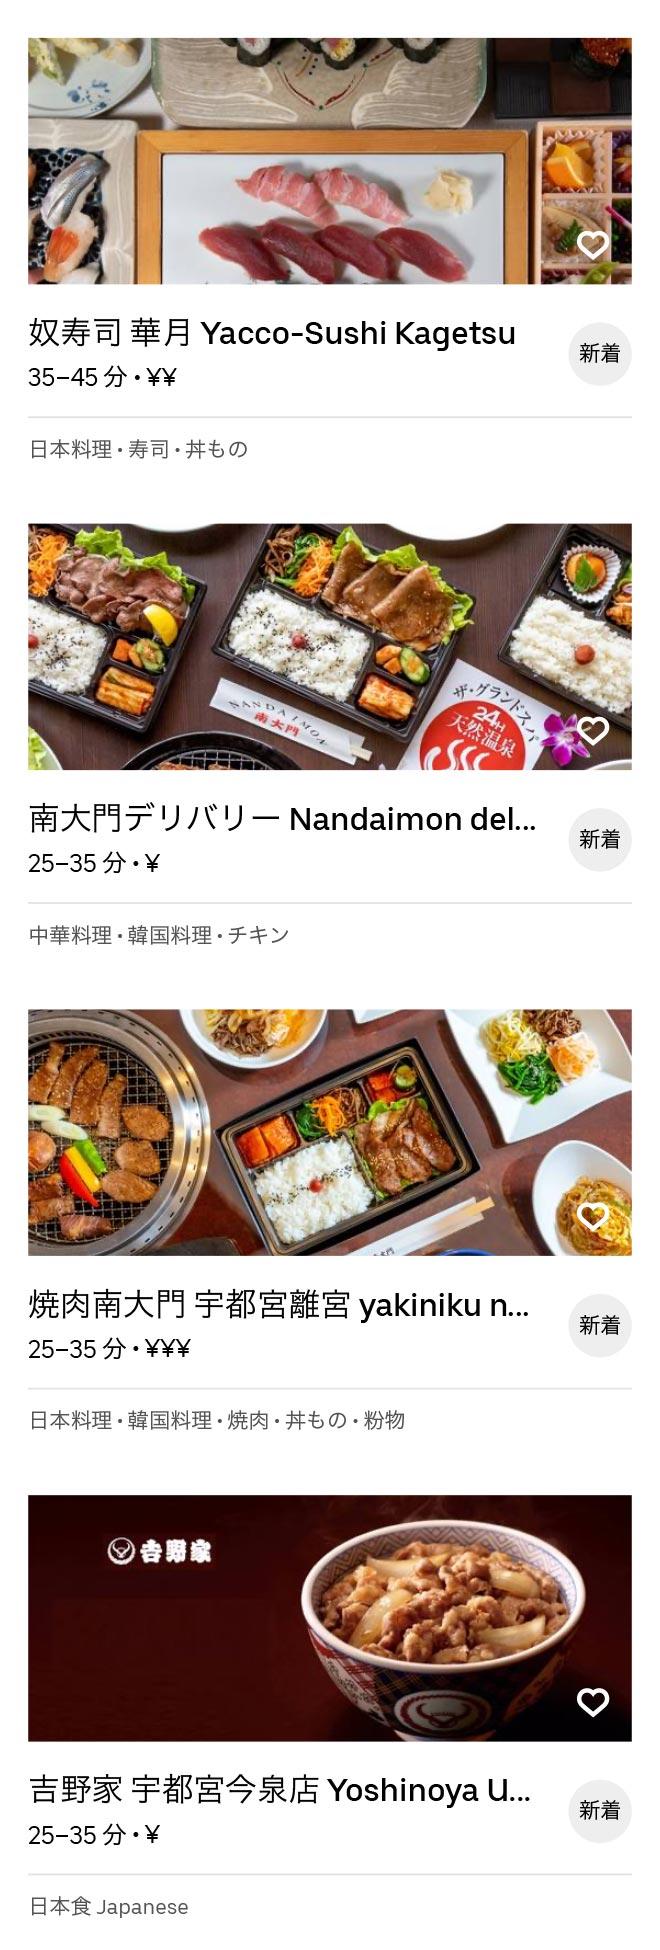 Utsunomiya menu 200603